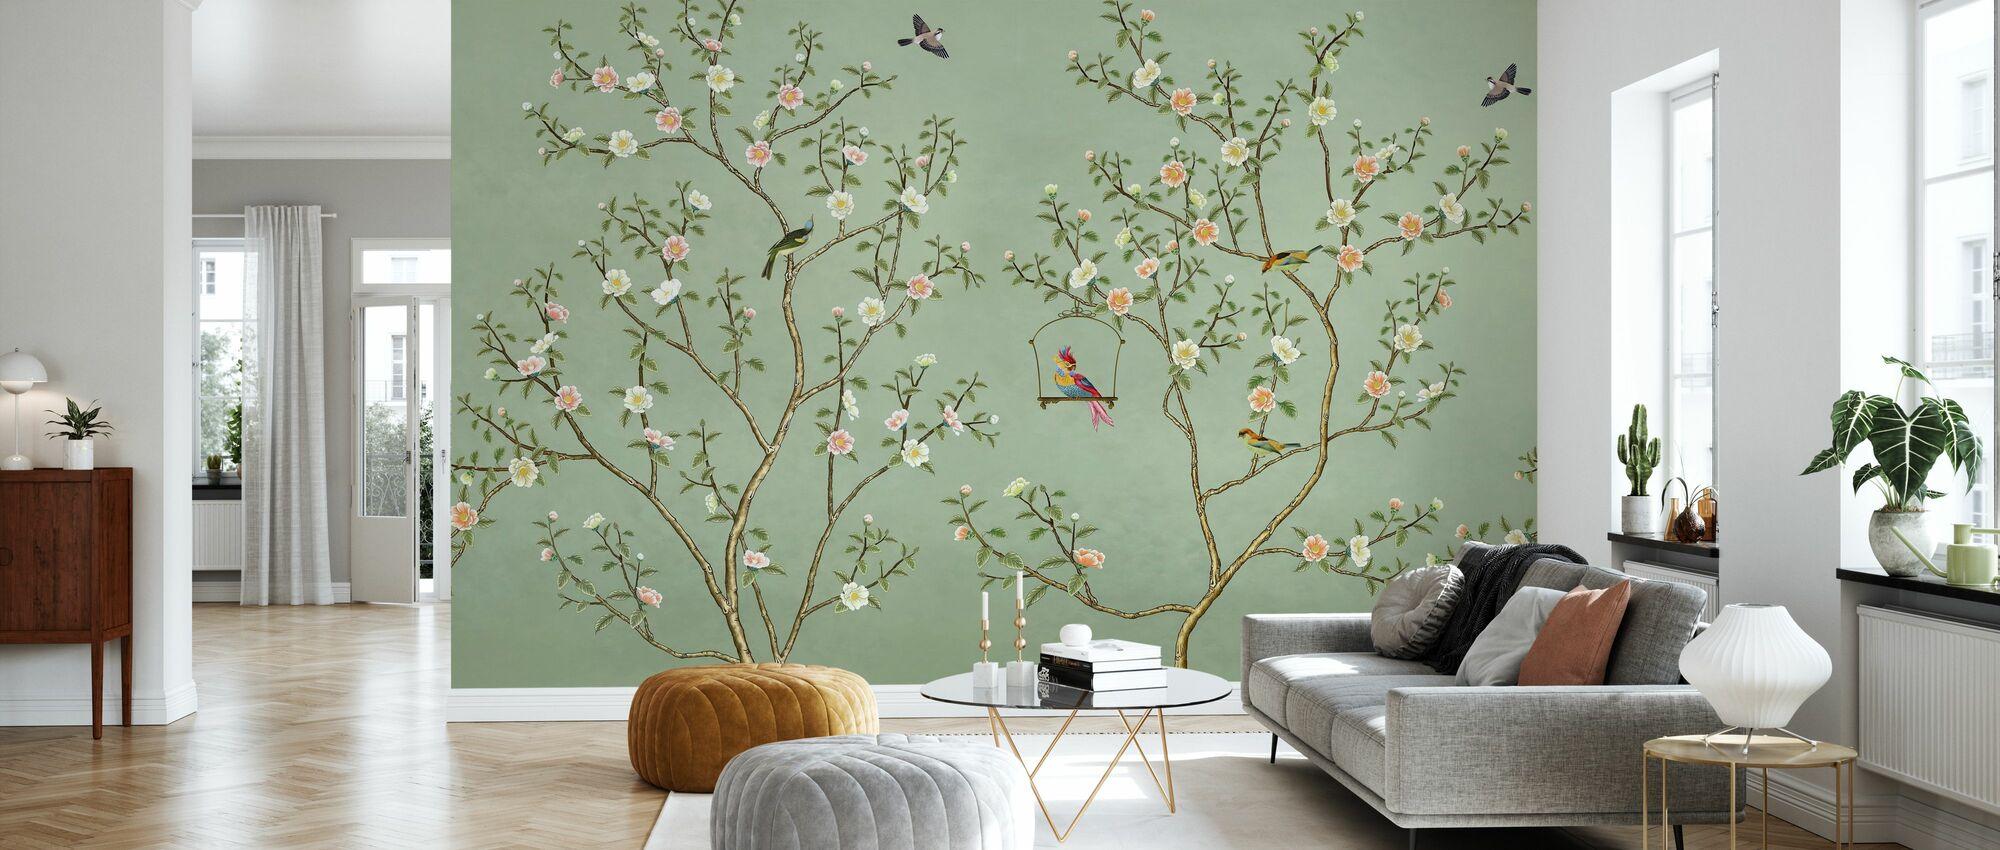 Birds Hangout - Emerald - Wallpaper - Living Room